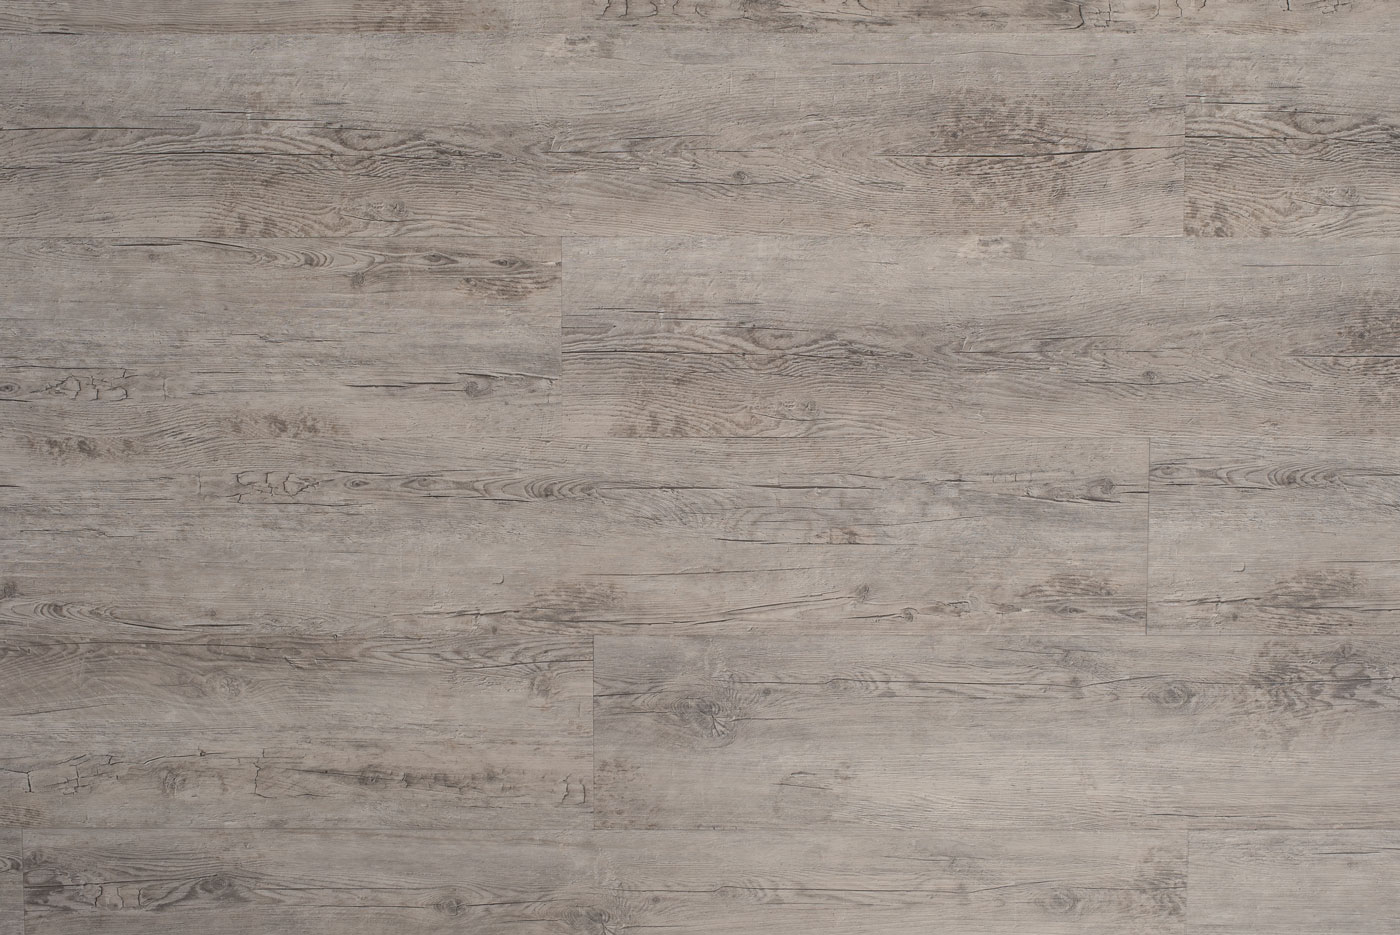 Floer dorpen pvc stolwijk steigerhout vinyl vloer grijs bruin